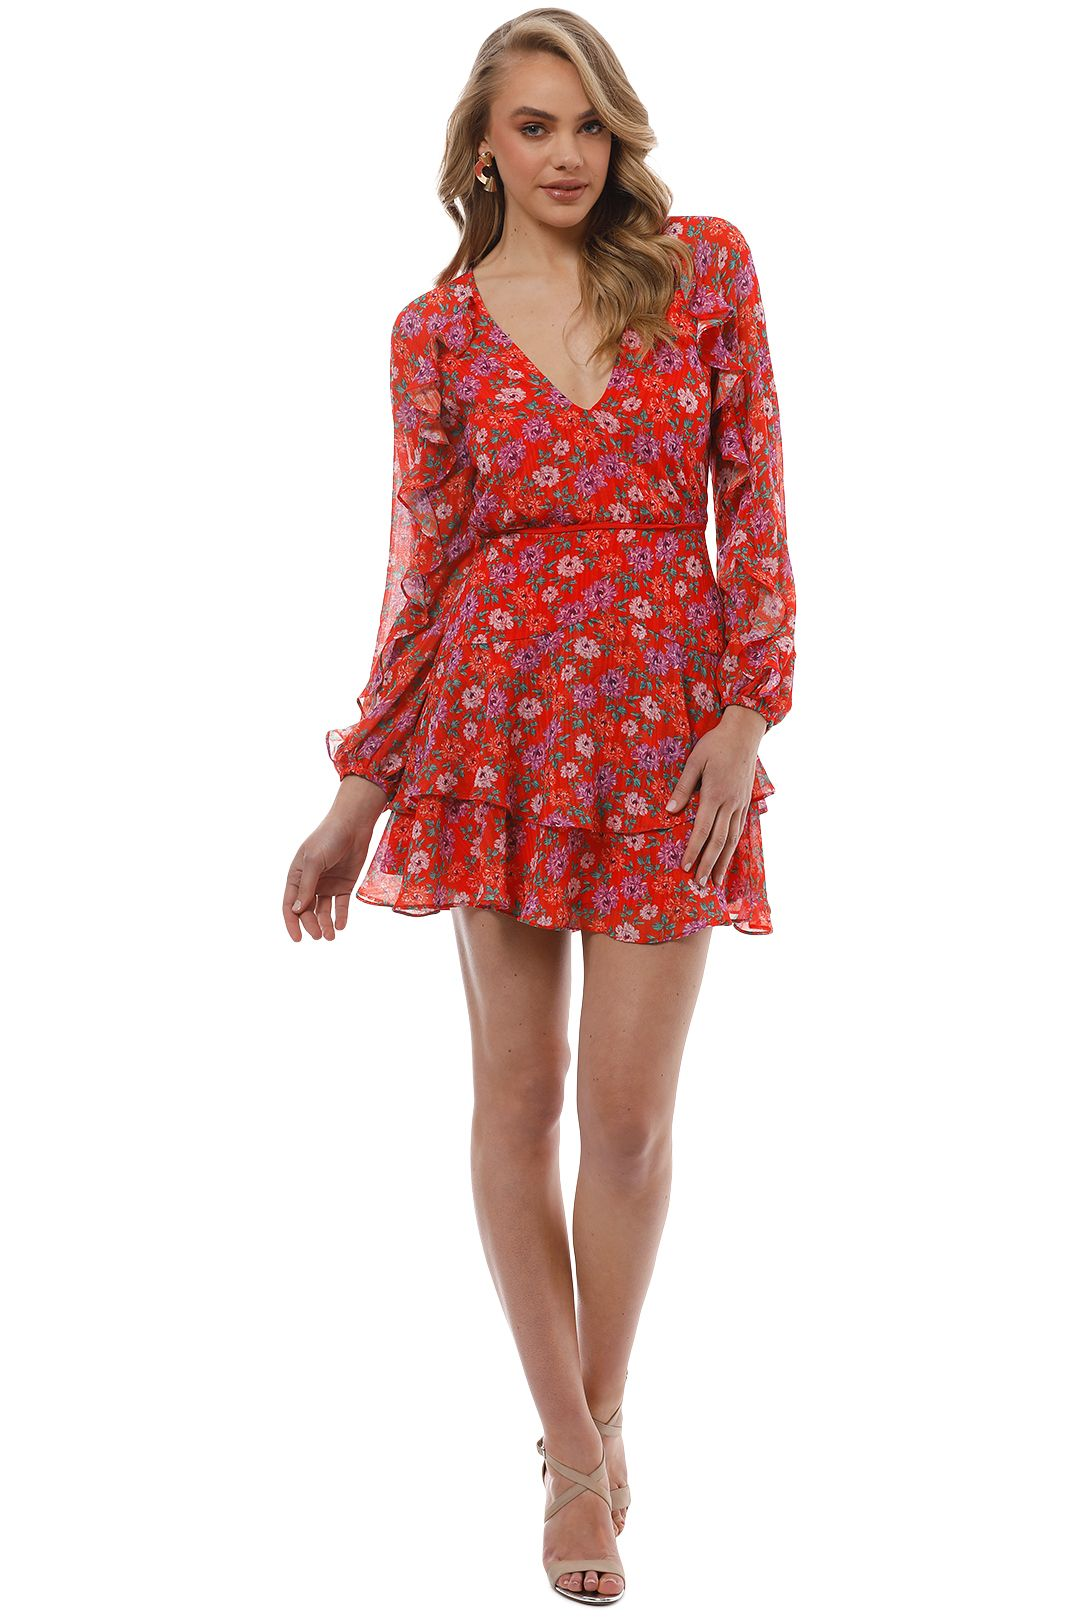 Talulah - Love Token Mini Dress - Token Print - Front